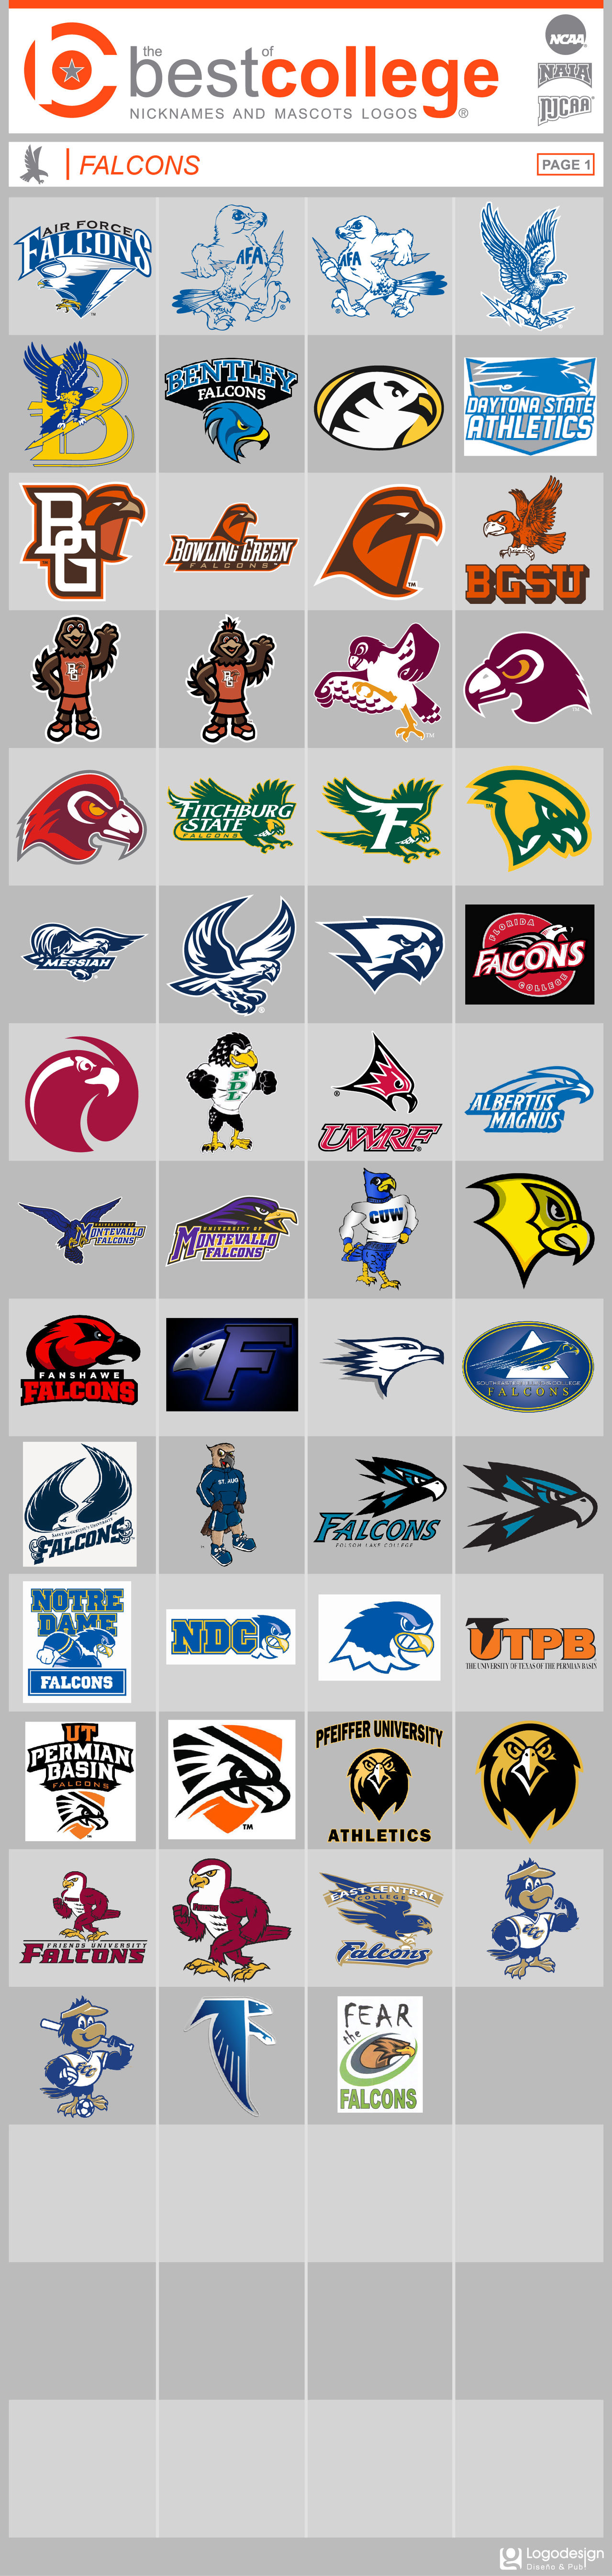 College football logos sports logo design sports team logos